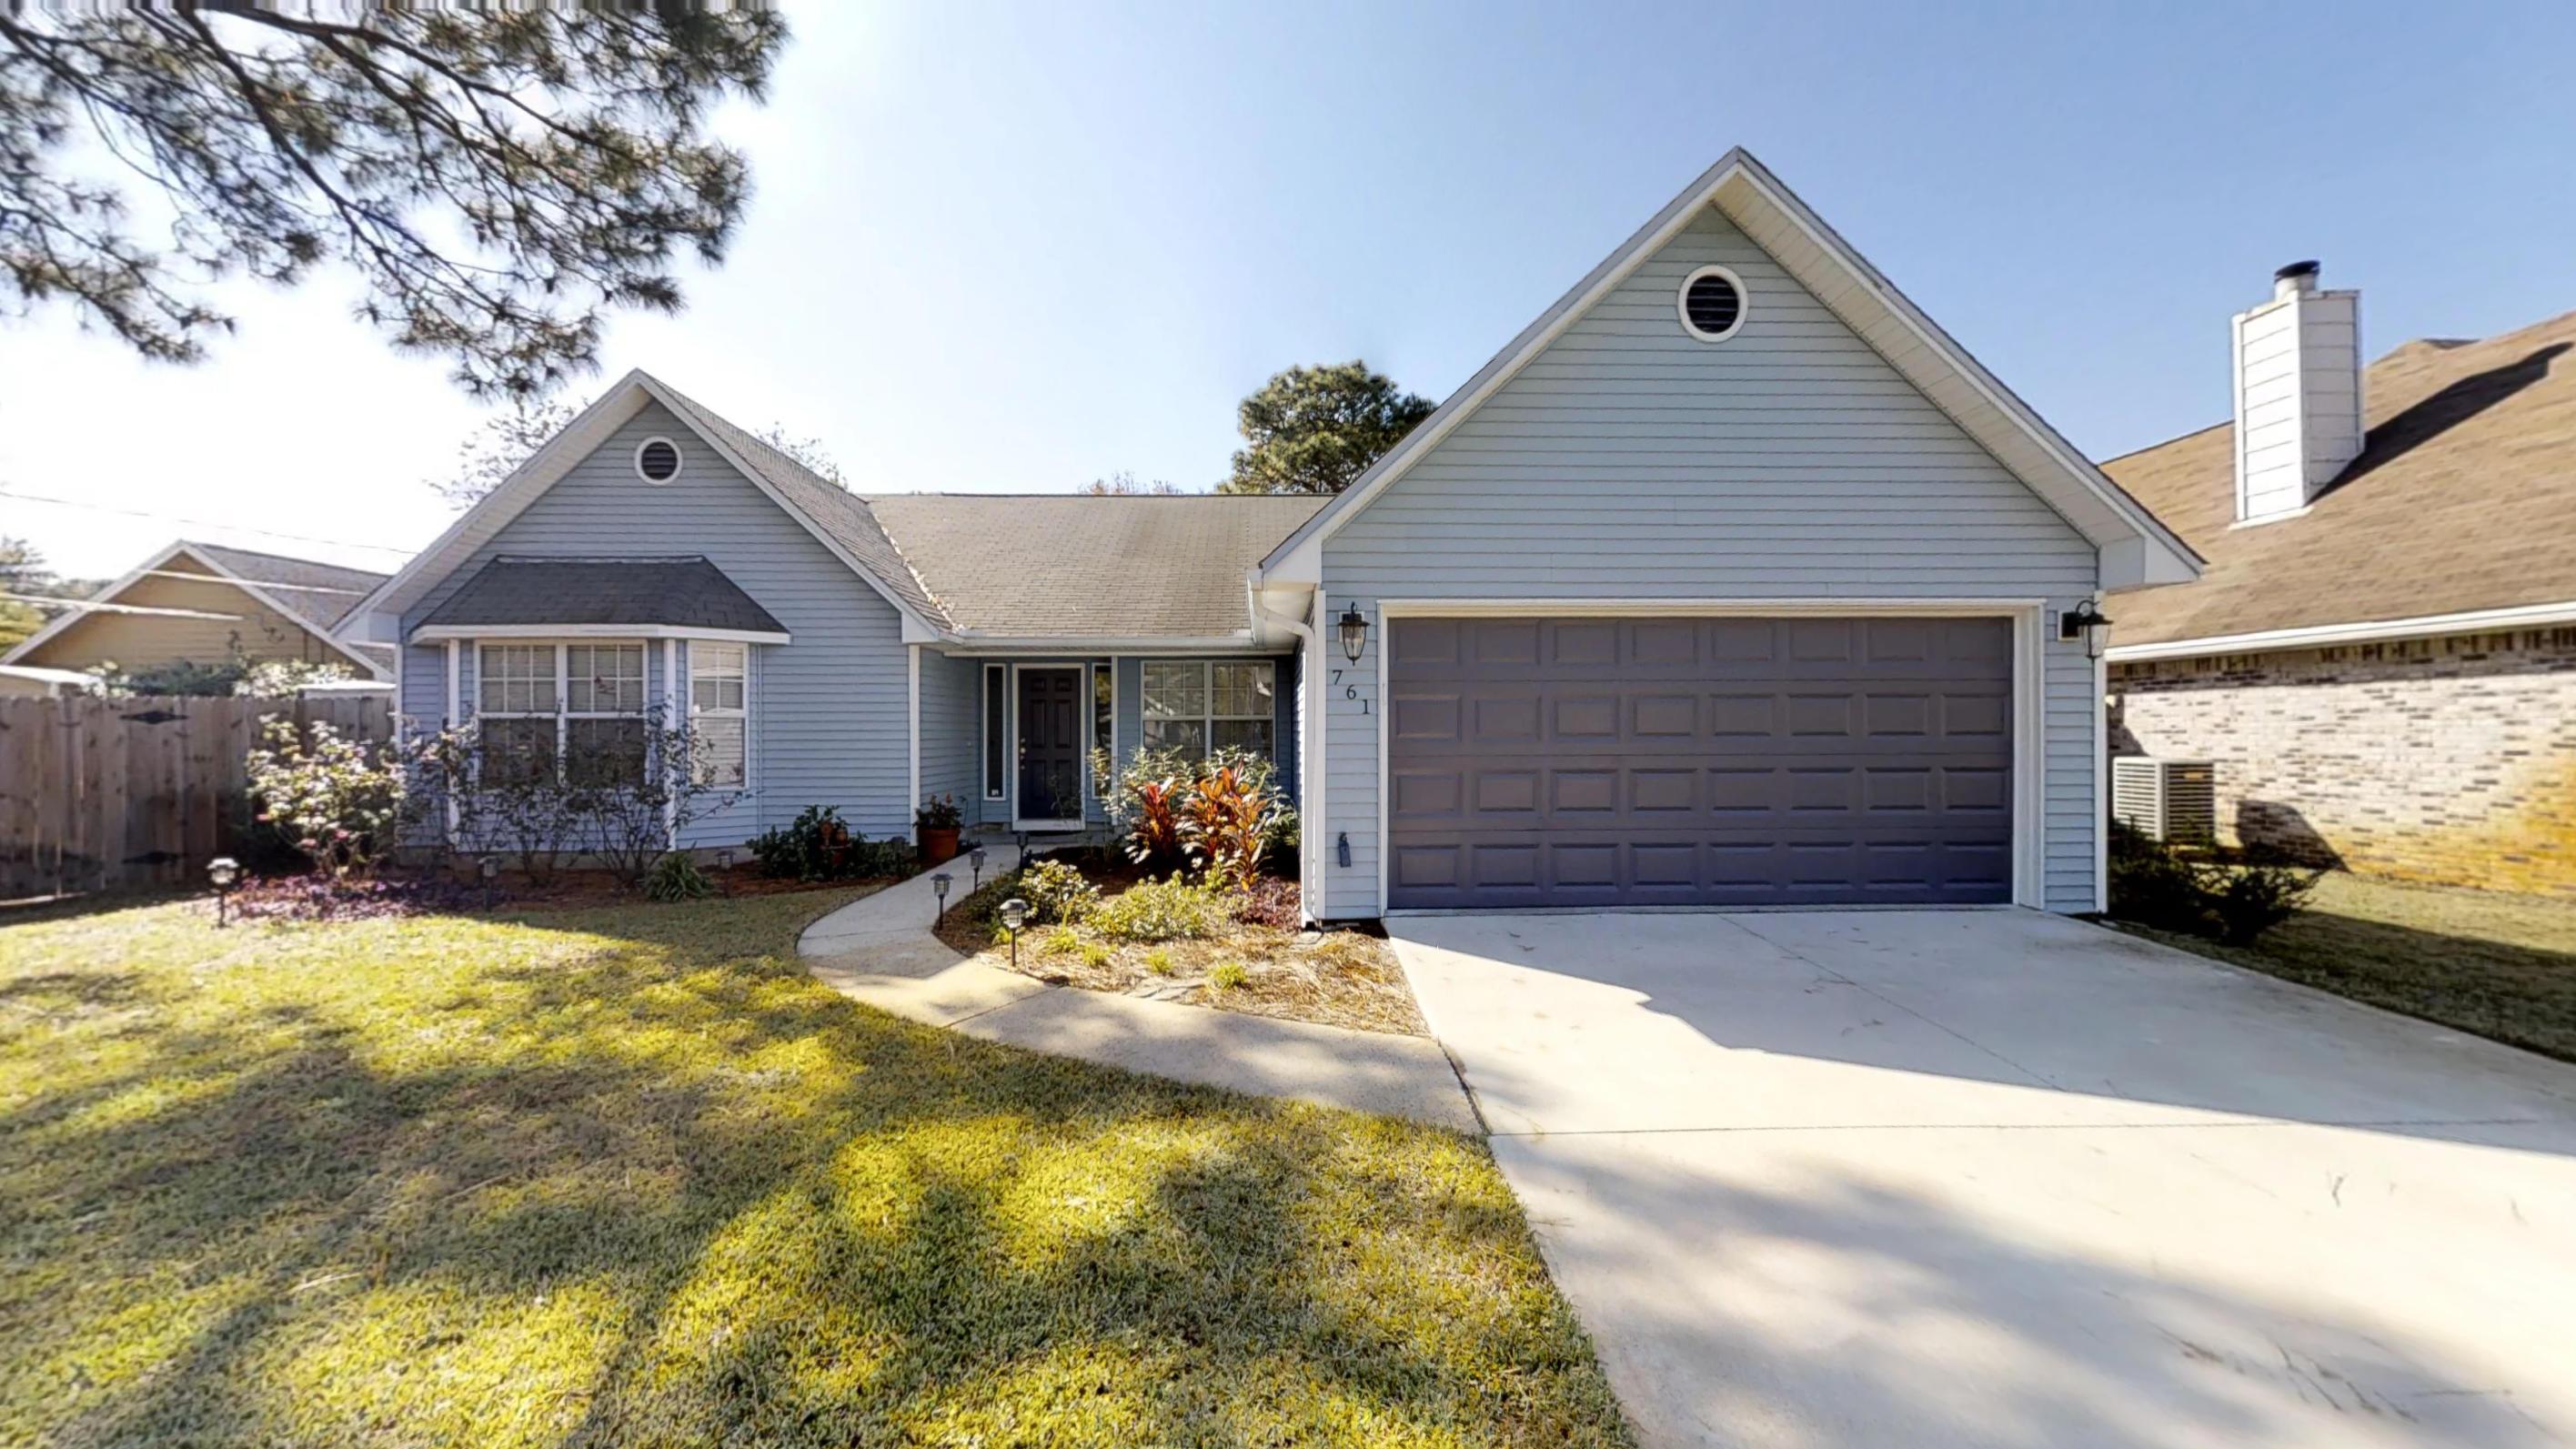 Photo of home for sale at 761 Vintage, Destin FL